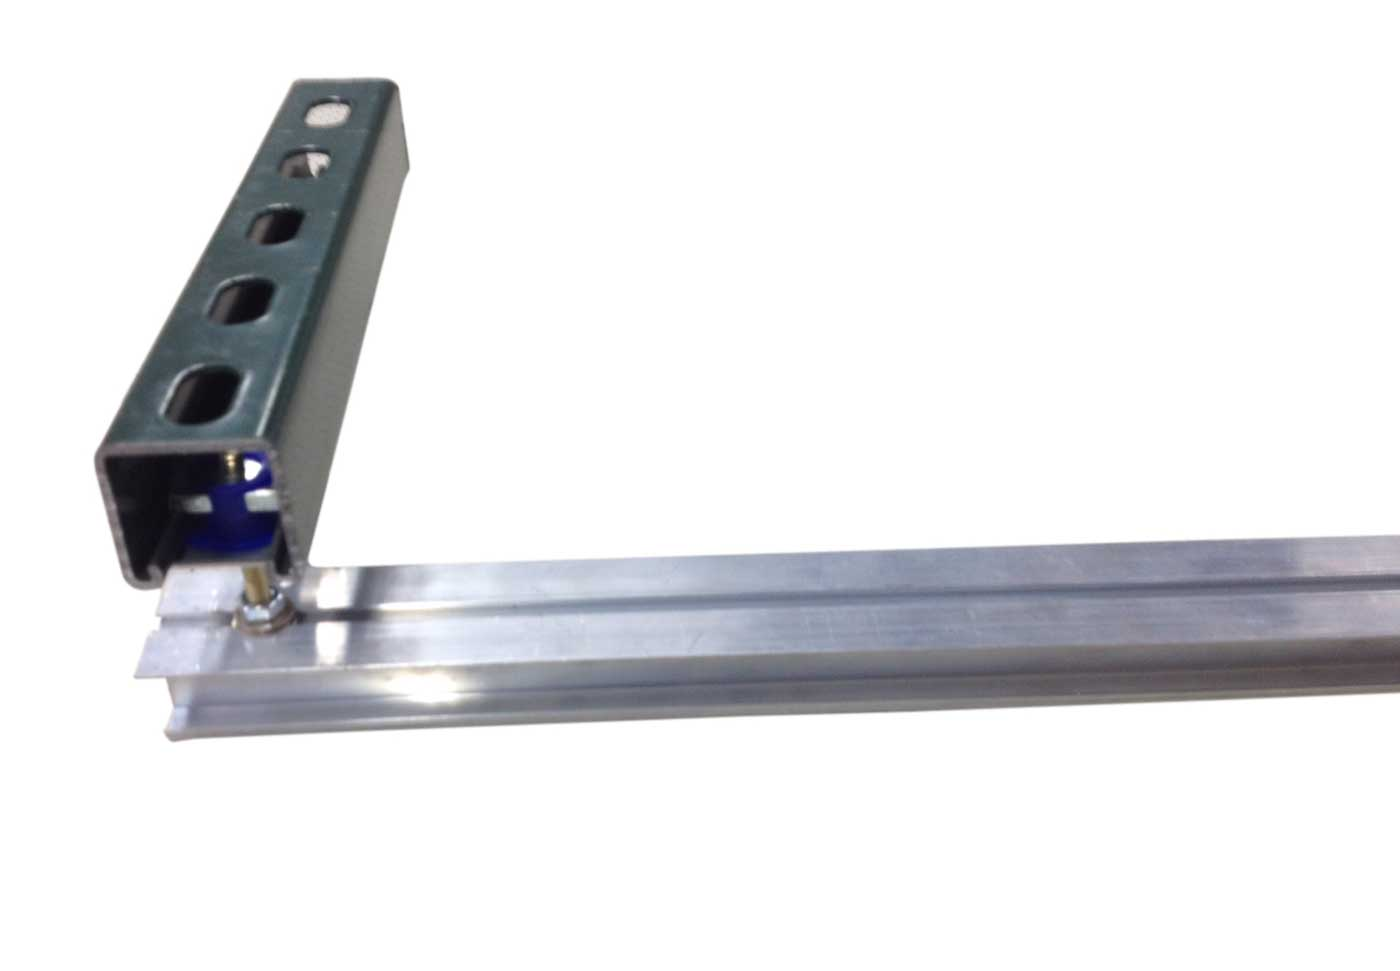 Lightrail Strut Channel Compatible Rails Allow For The